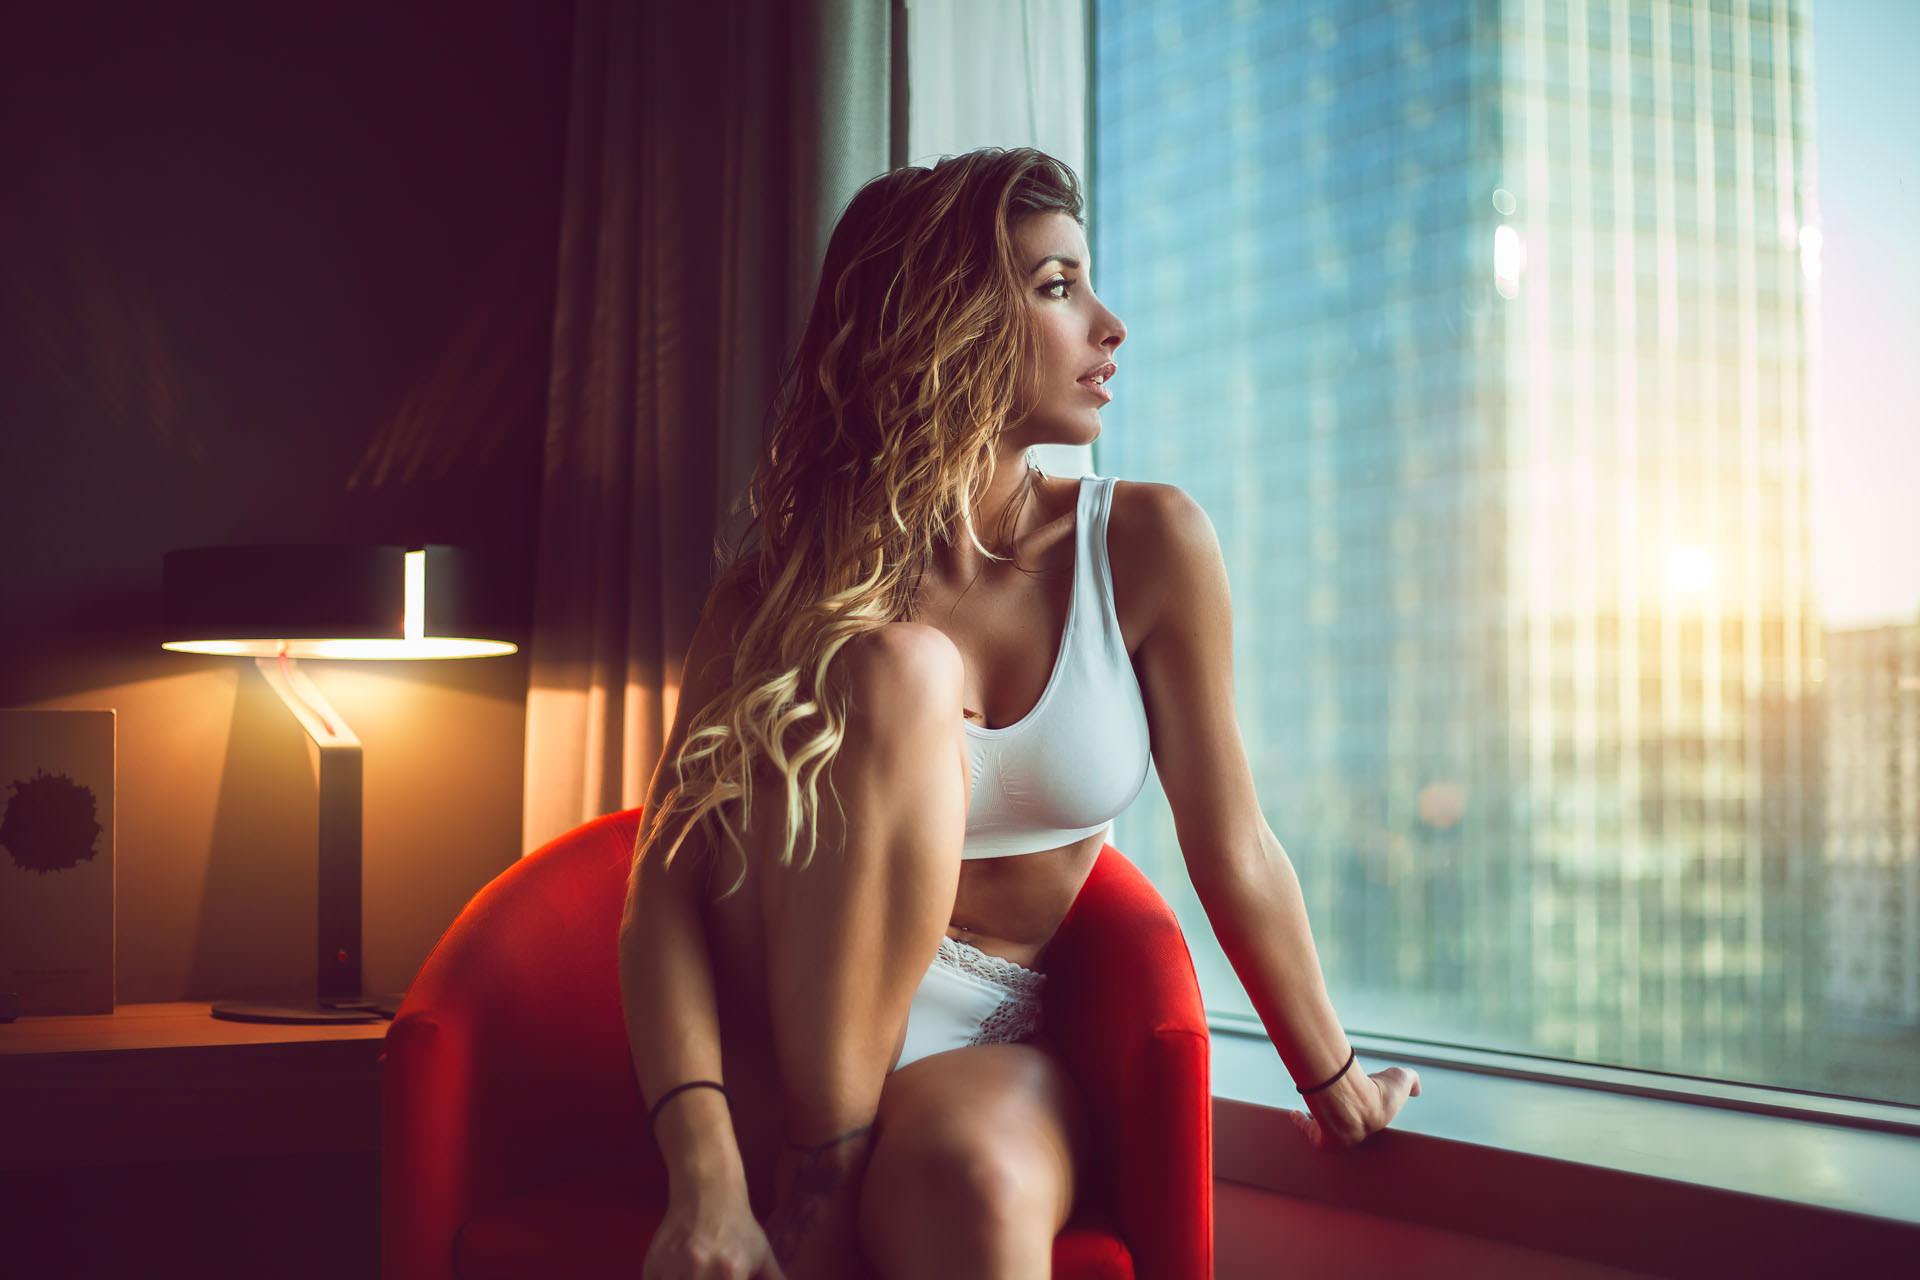 2017-01-20 - Melyna - Hotel Melia - 1126 - 1920px